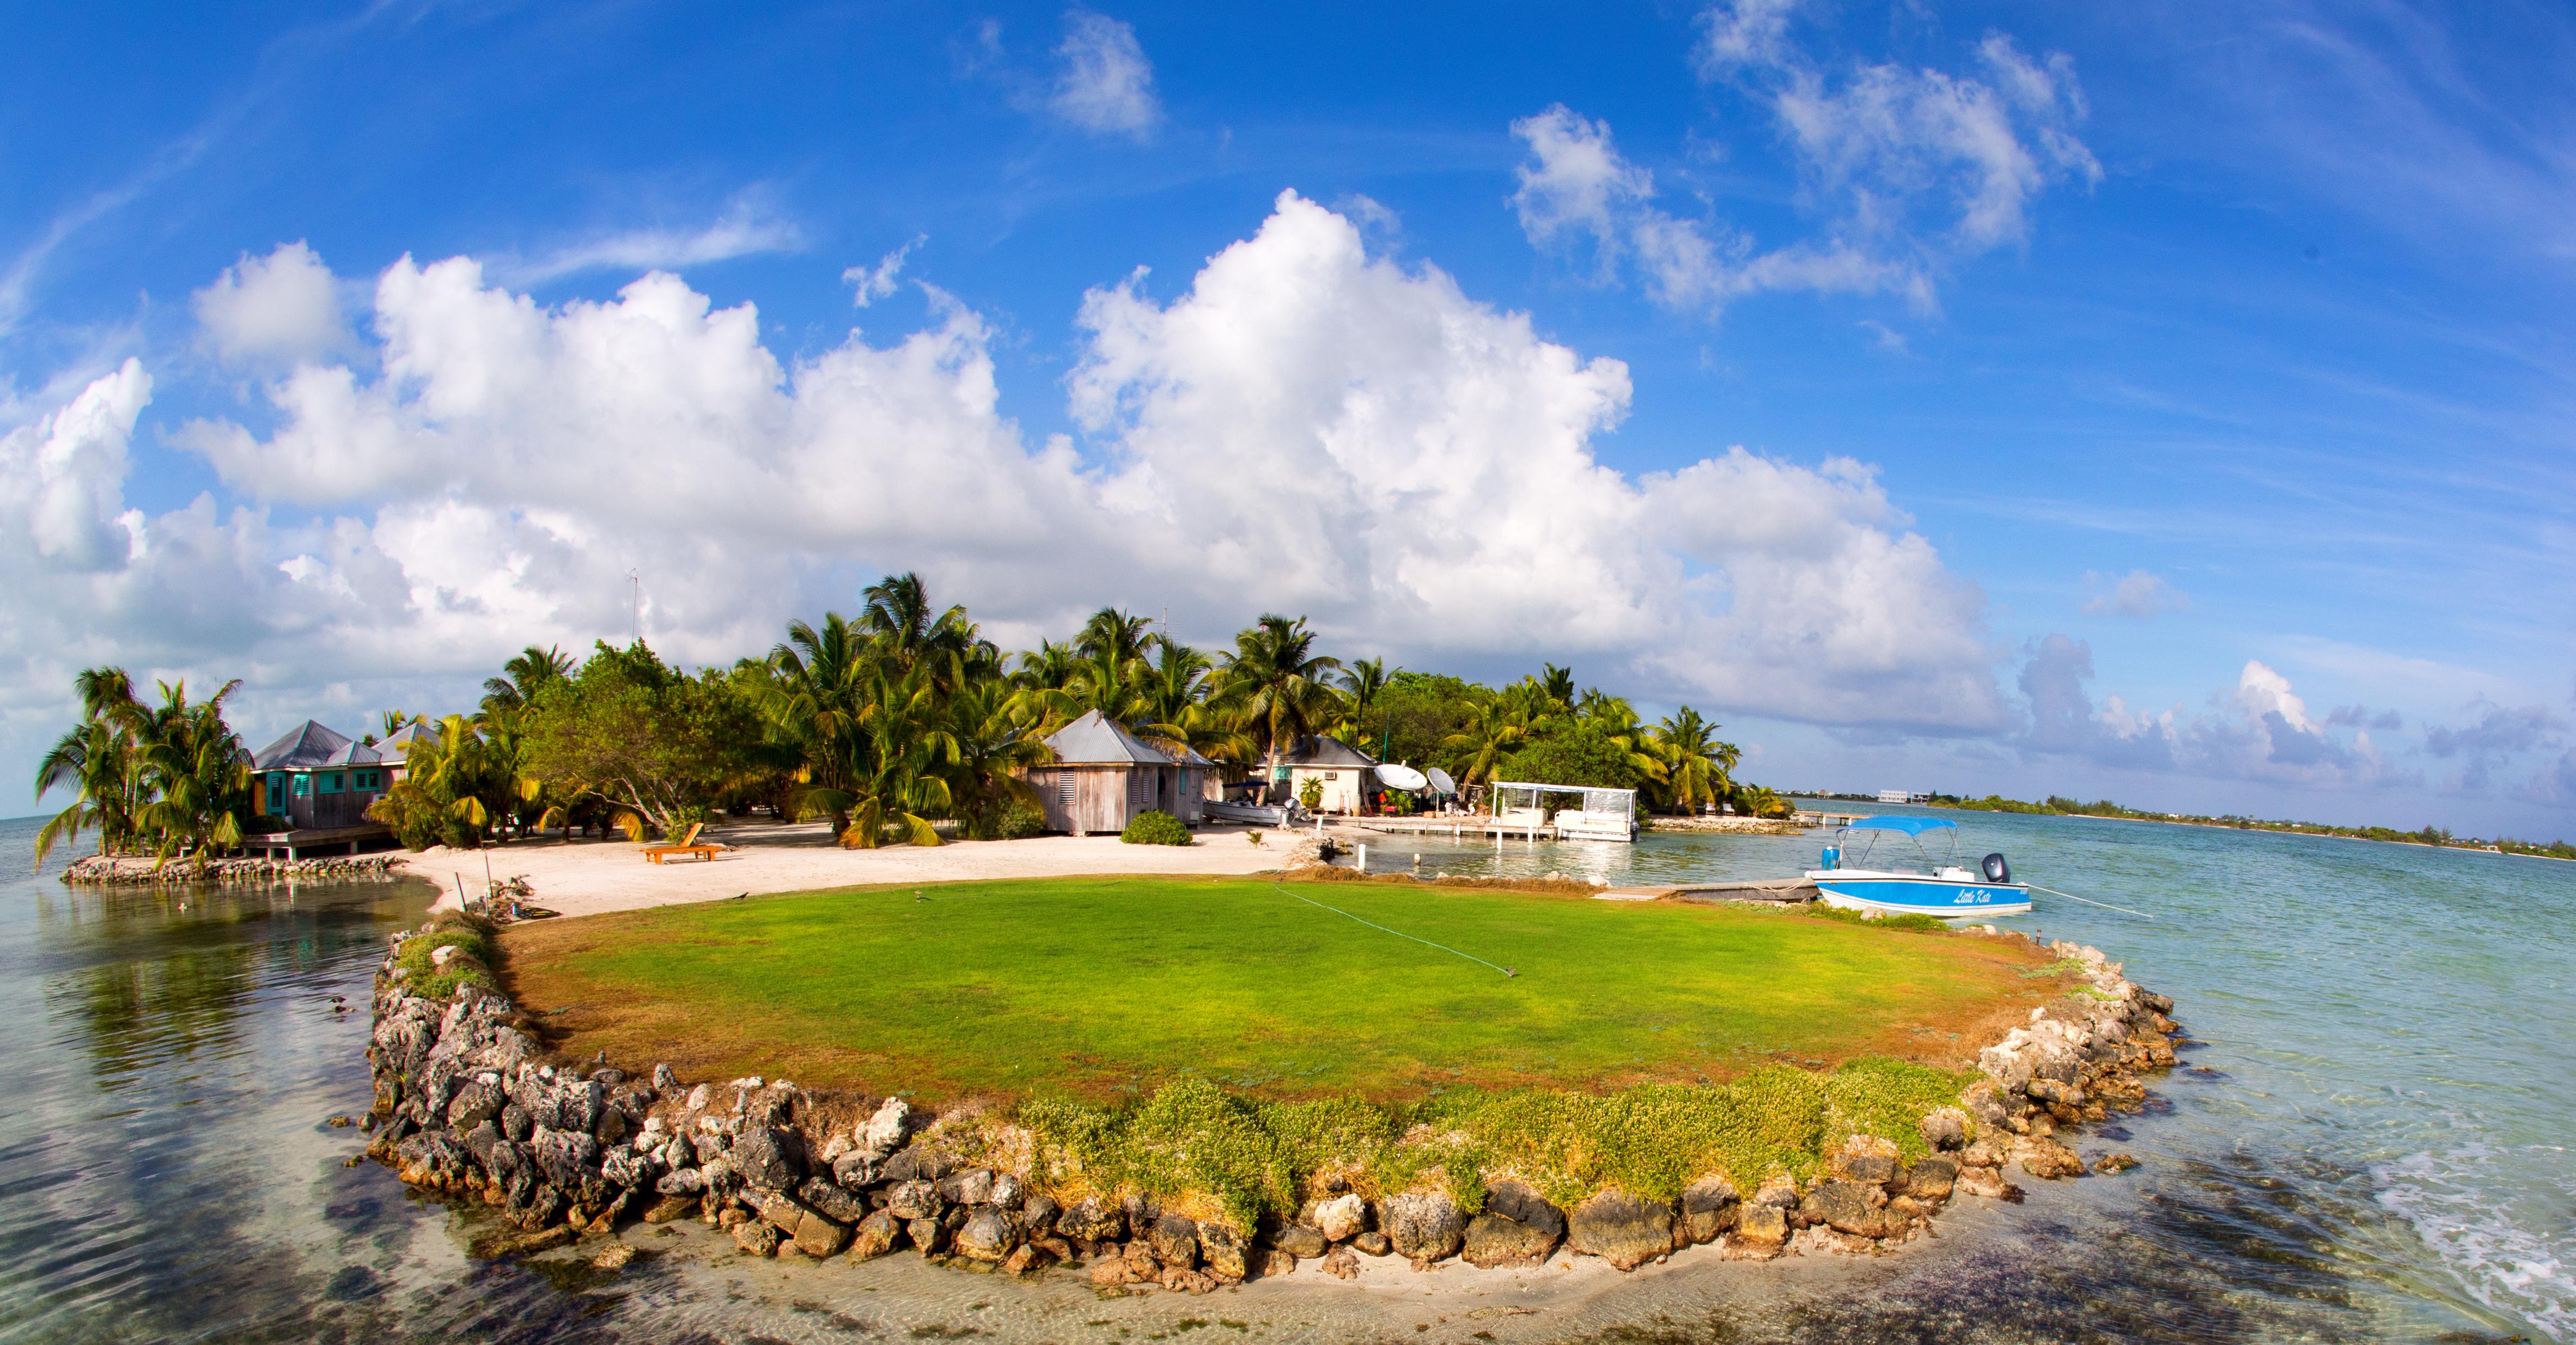 Private Island W Star Parks And Hush November